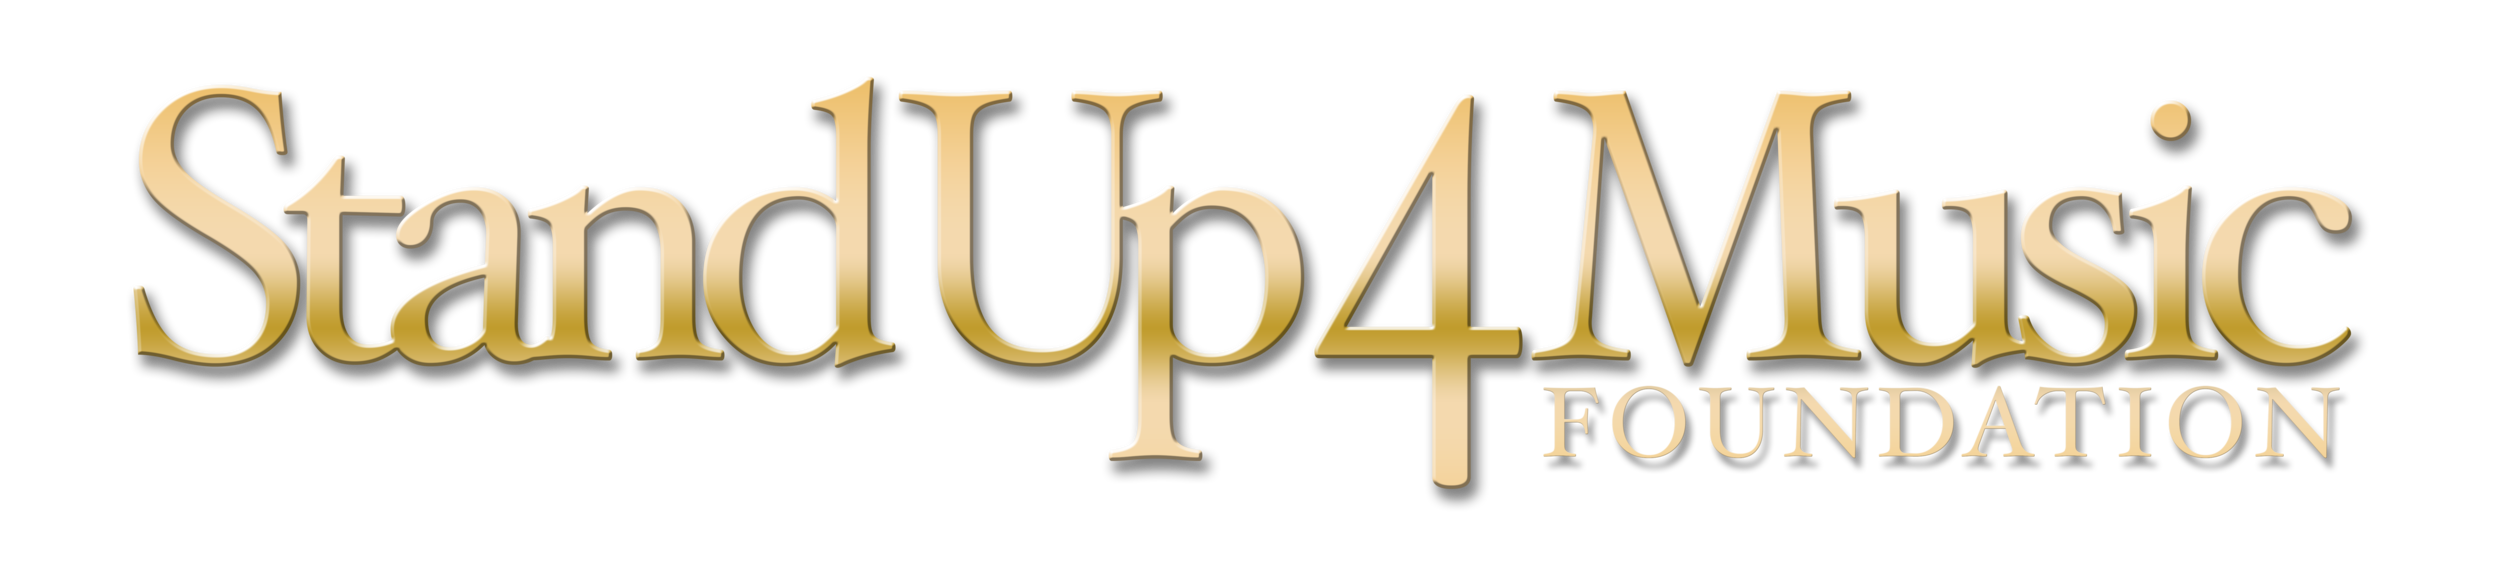 SU4M Logo-gold 300dpi.png